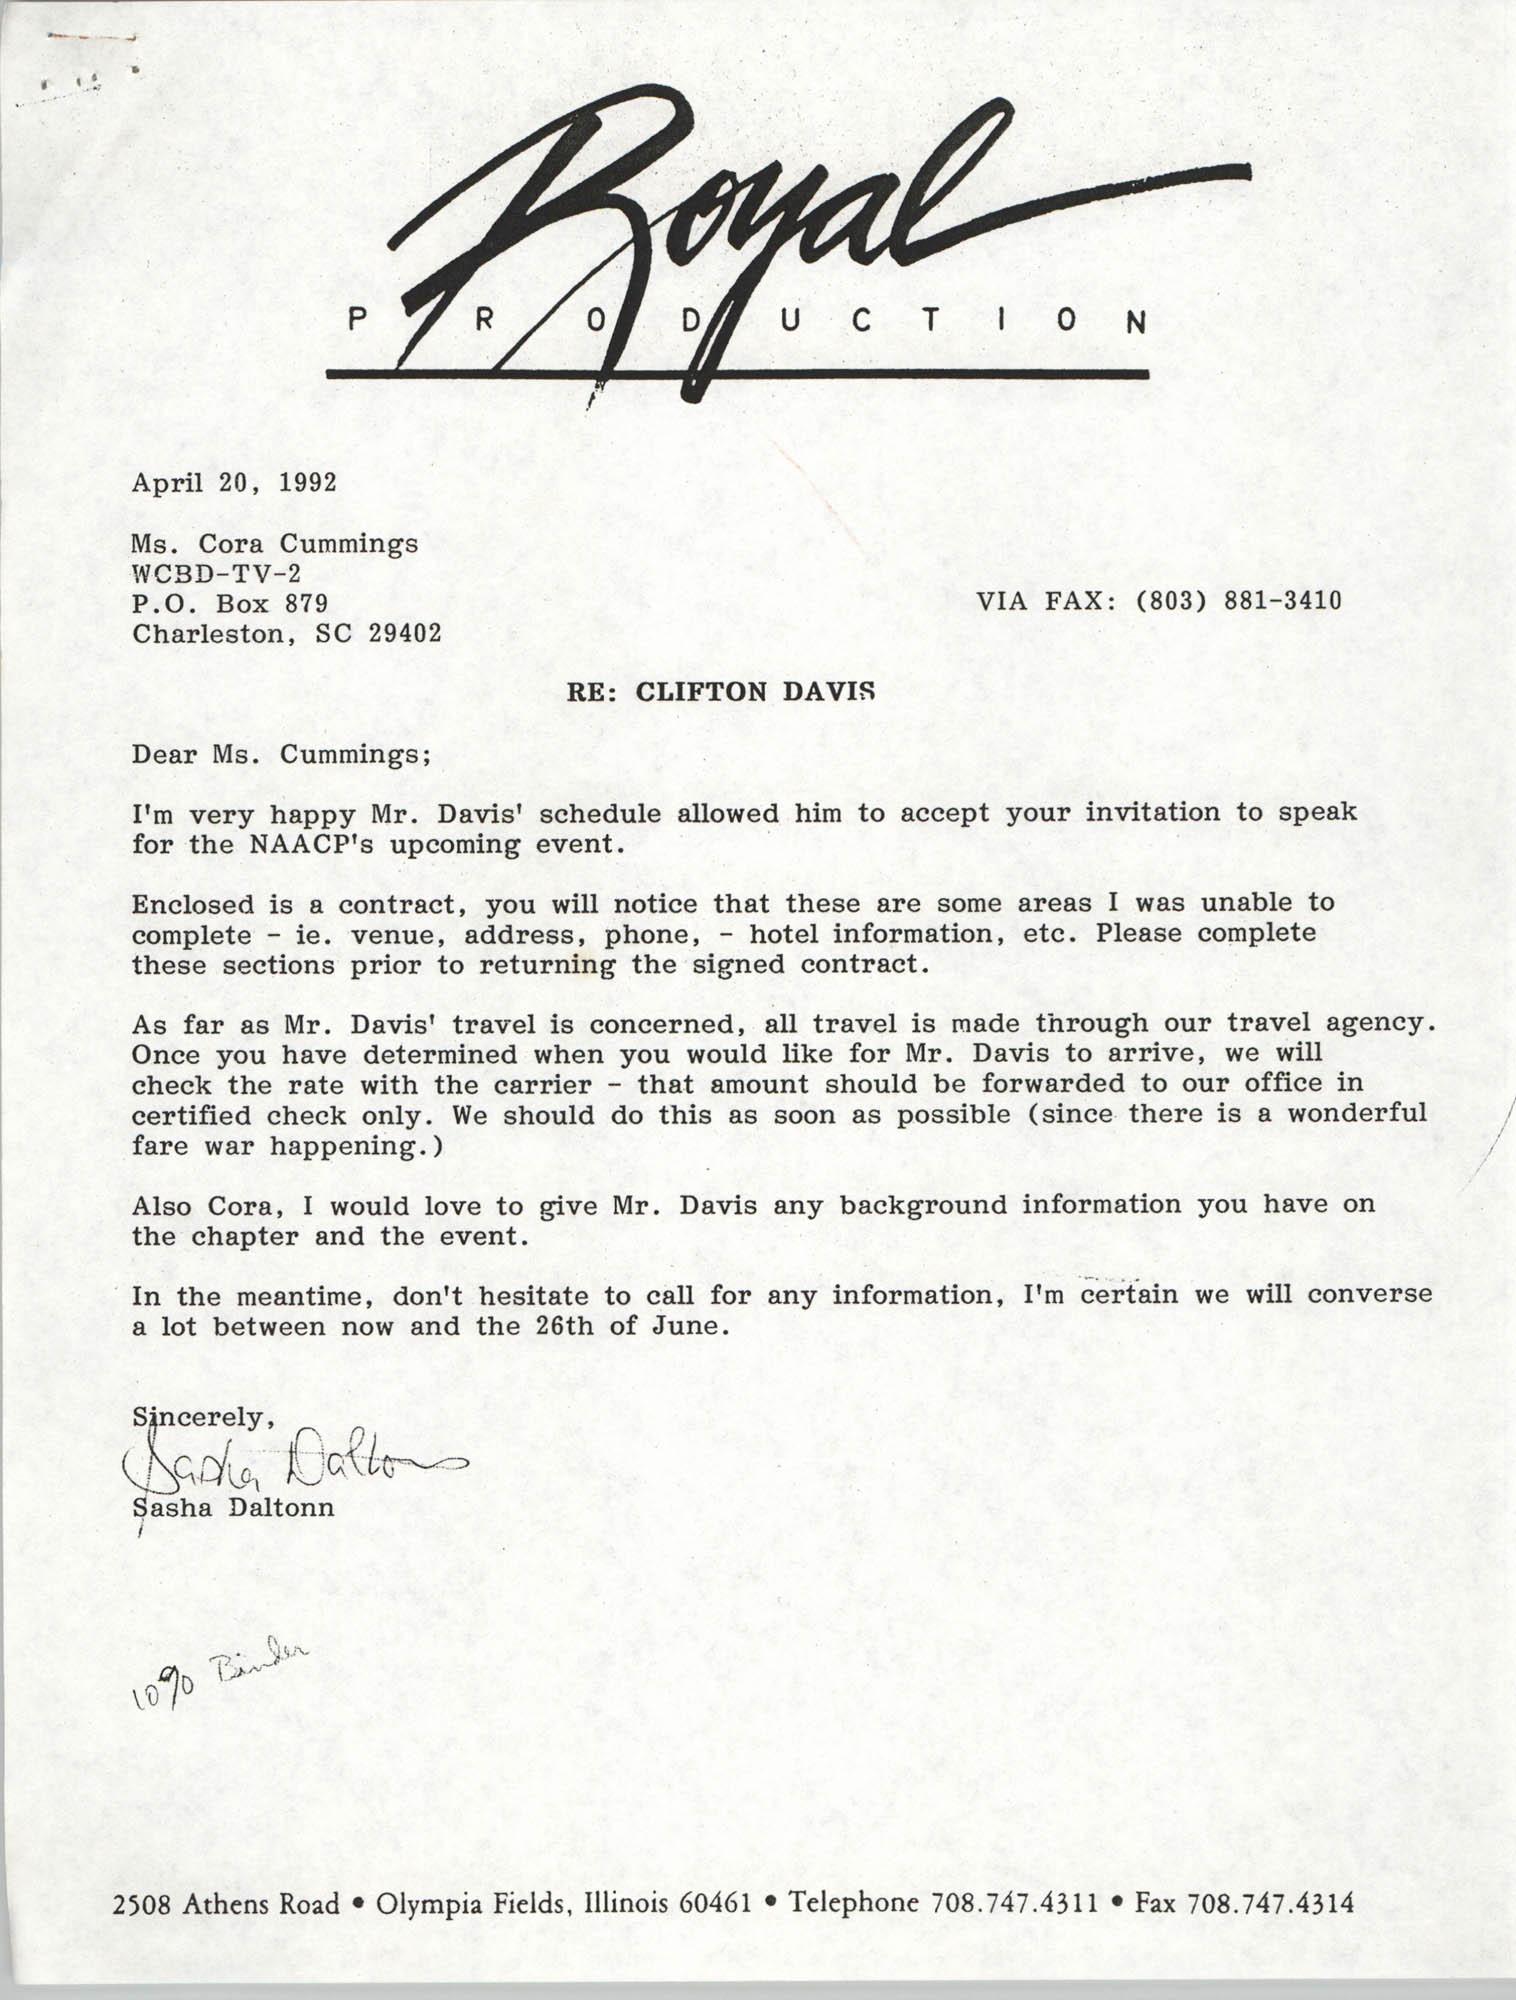 Letter from Sasha Daltonn to Cora Cummings, April 20, 1992